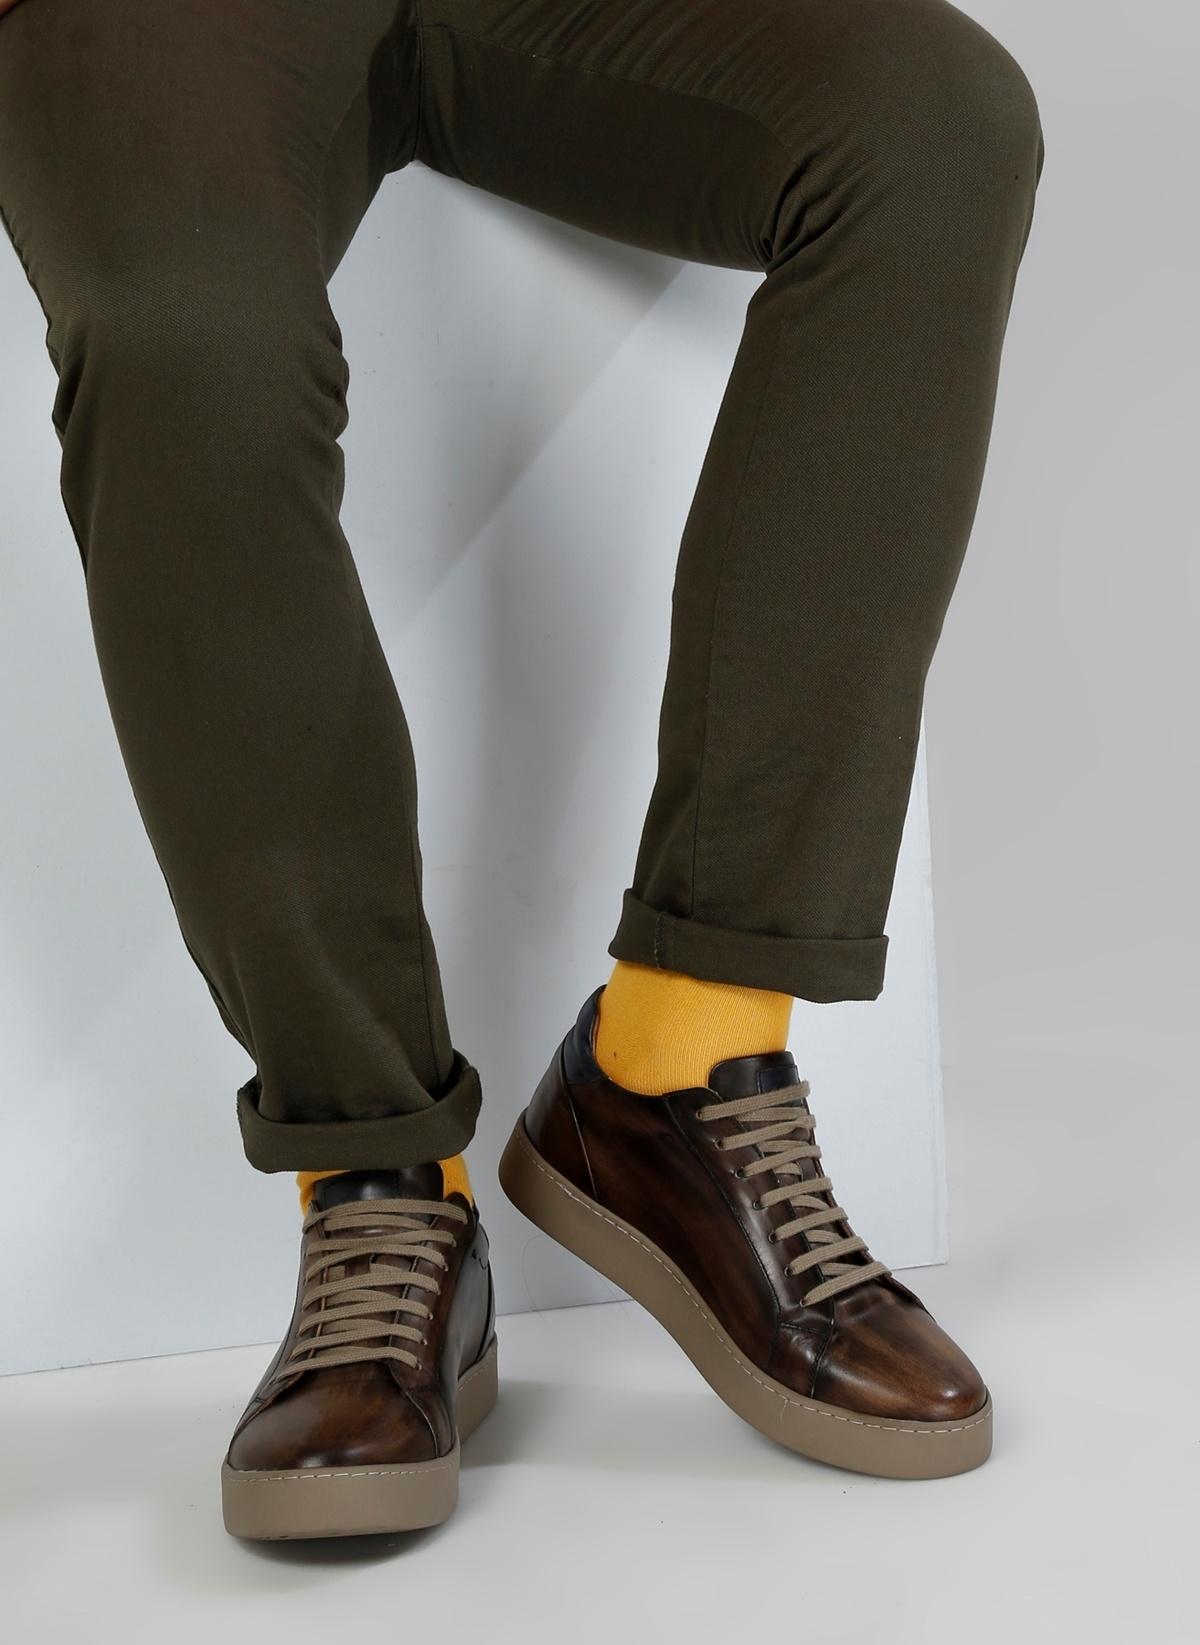 Fabrika Spor Ayakkabı 28-davın Fabrika Koşu Ayakkabısı – 199.99 TL